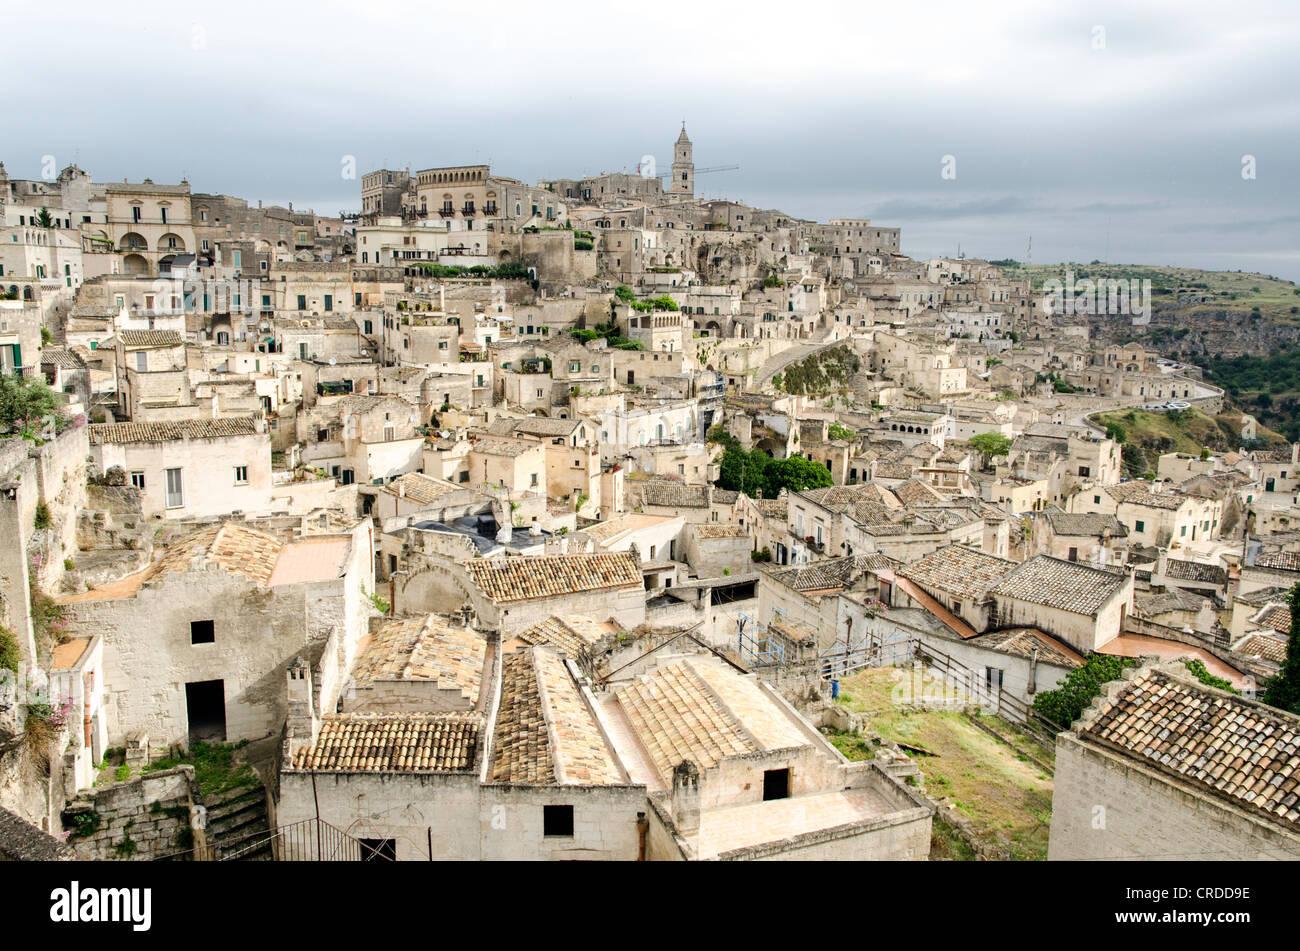 Matera citta dei Sassi Basilicata region South Italy - Stock Image